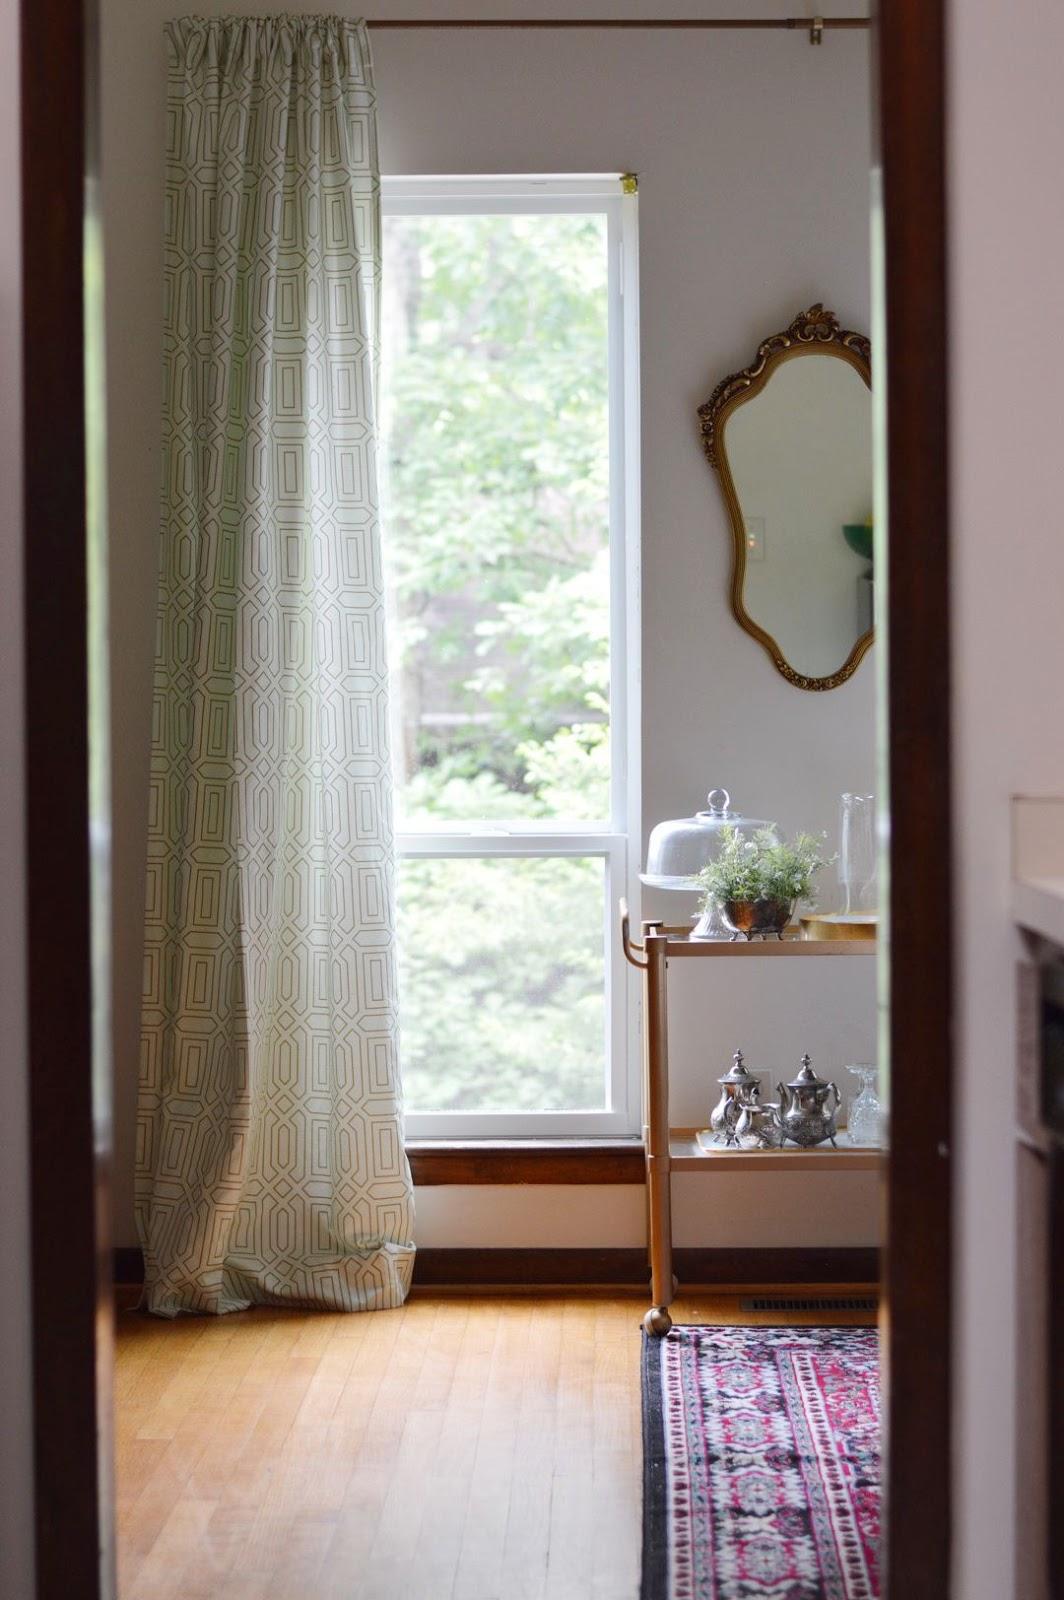 Eclectic decor, summer eclectic home tour, domicile 37, vintage decor, edgy home decor, minted curtains, rental living, rental DIY